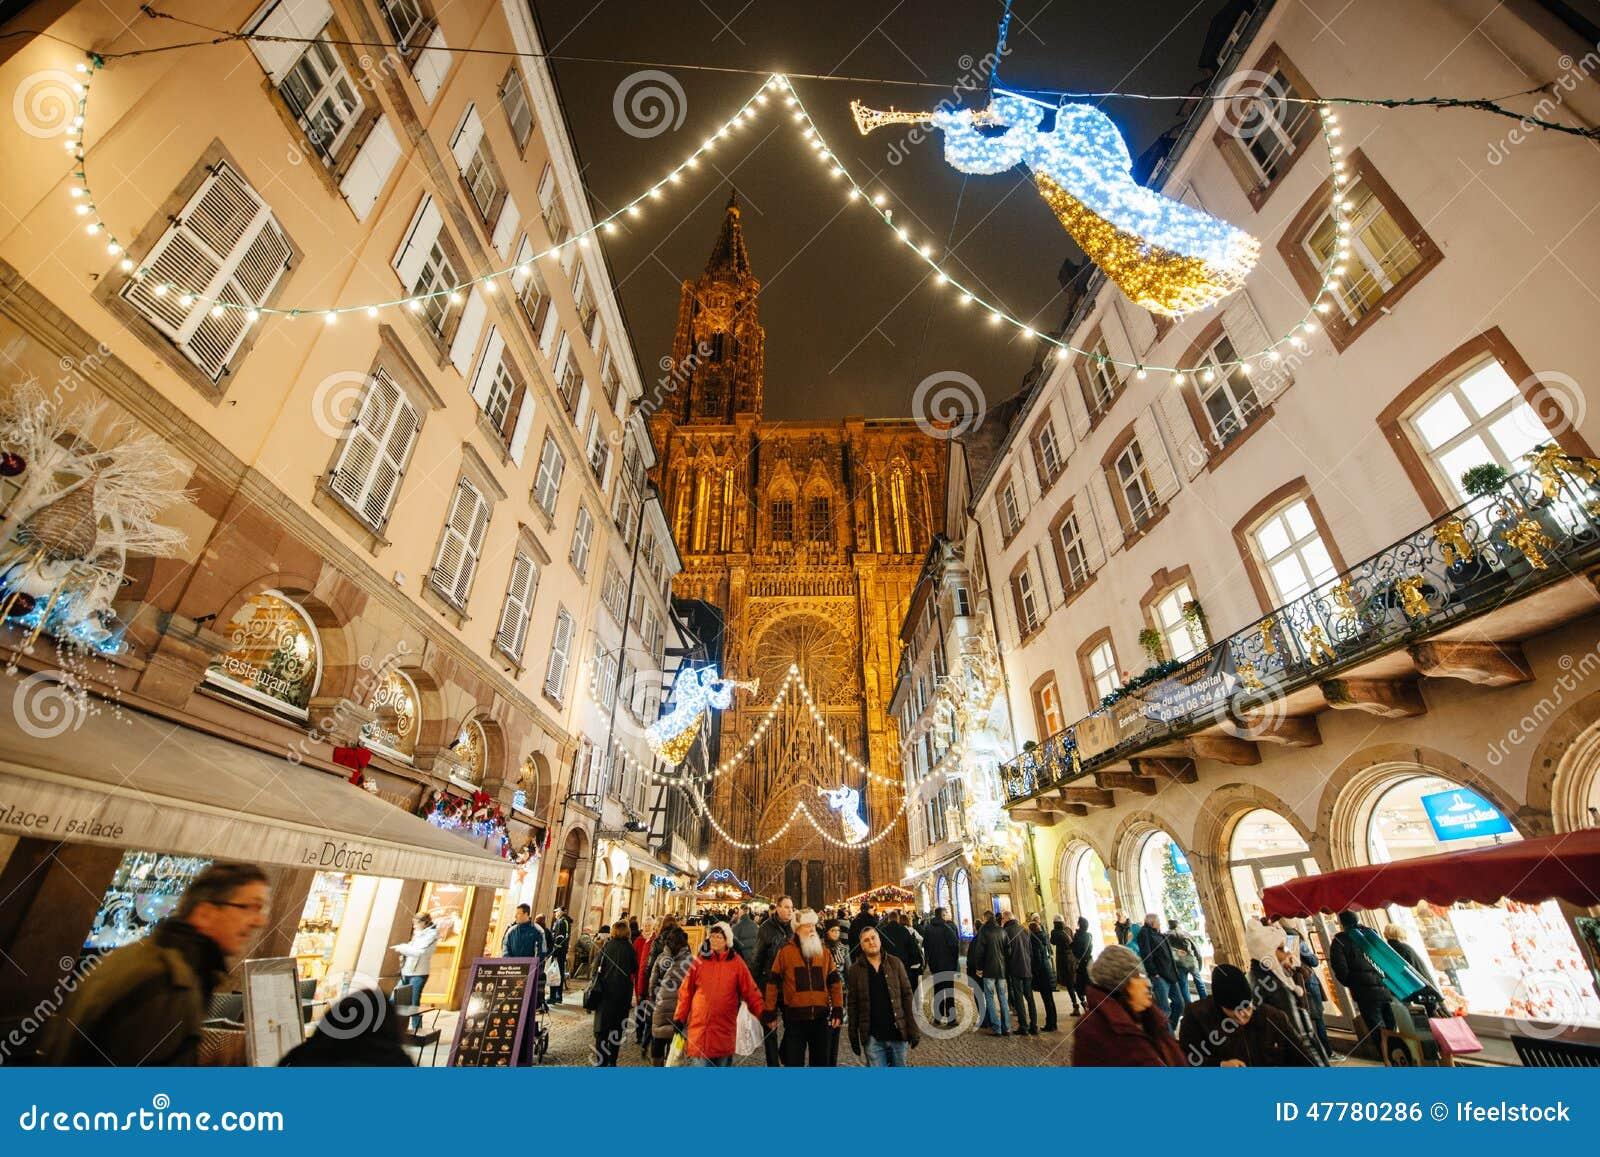 the oldest christmas market in europe strasbourg alsace fran editorial photo image 47780286. Black Bedroom Furniture Sets. Home Design Ideas